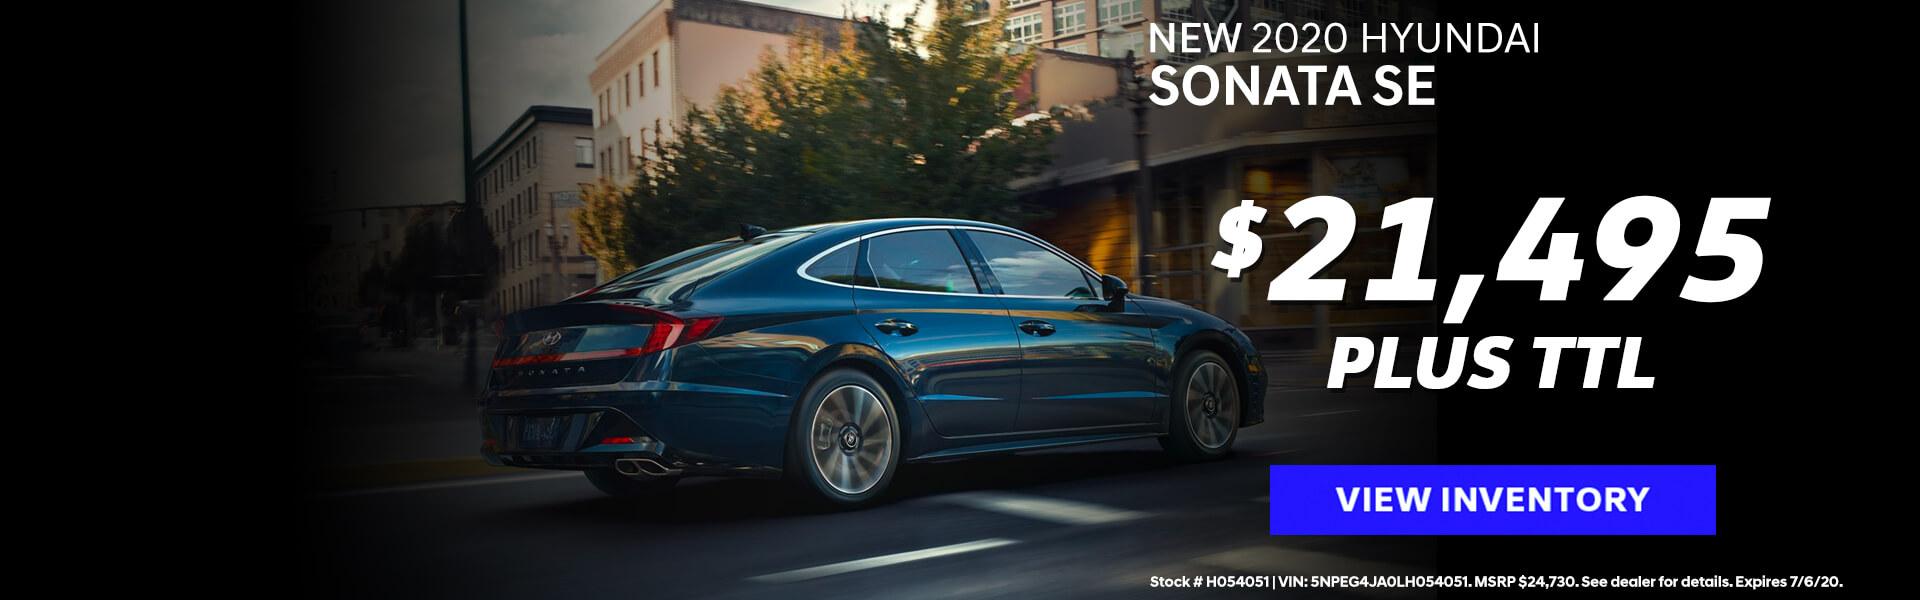 Hyundai - Sonata Offer (Employee Pricing)